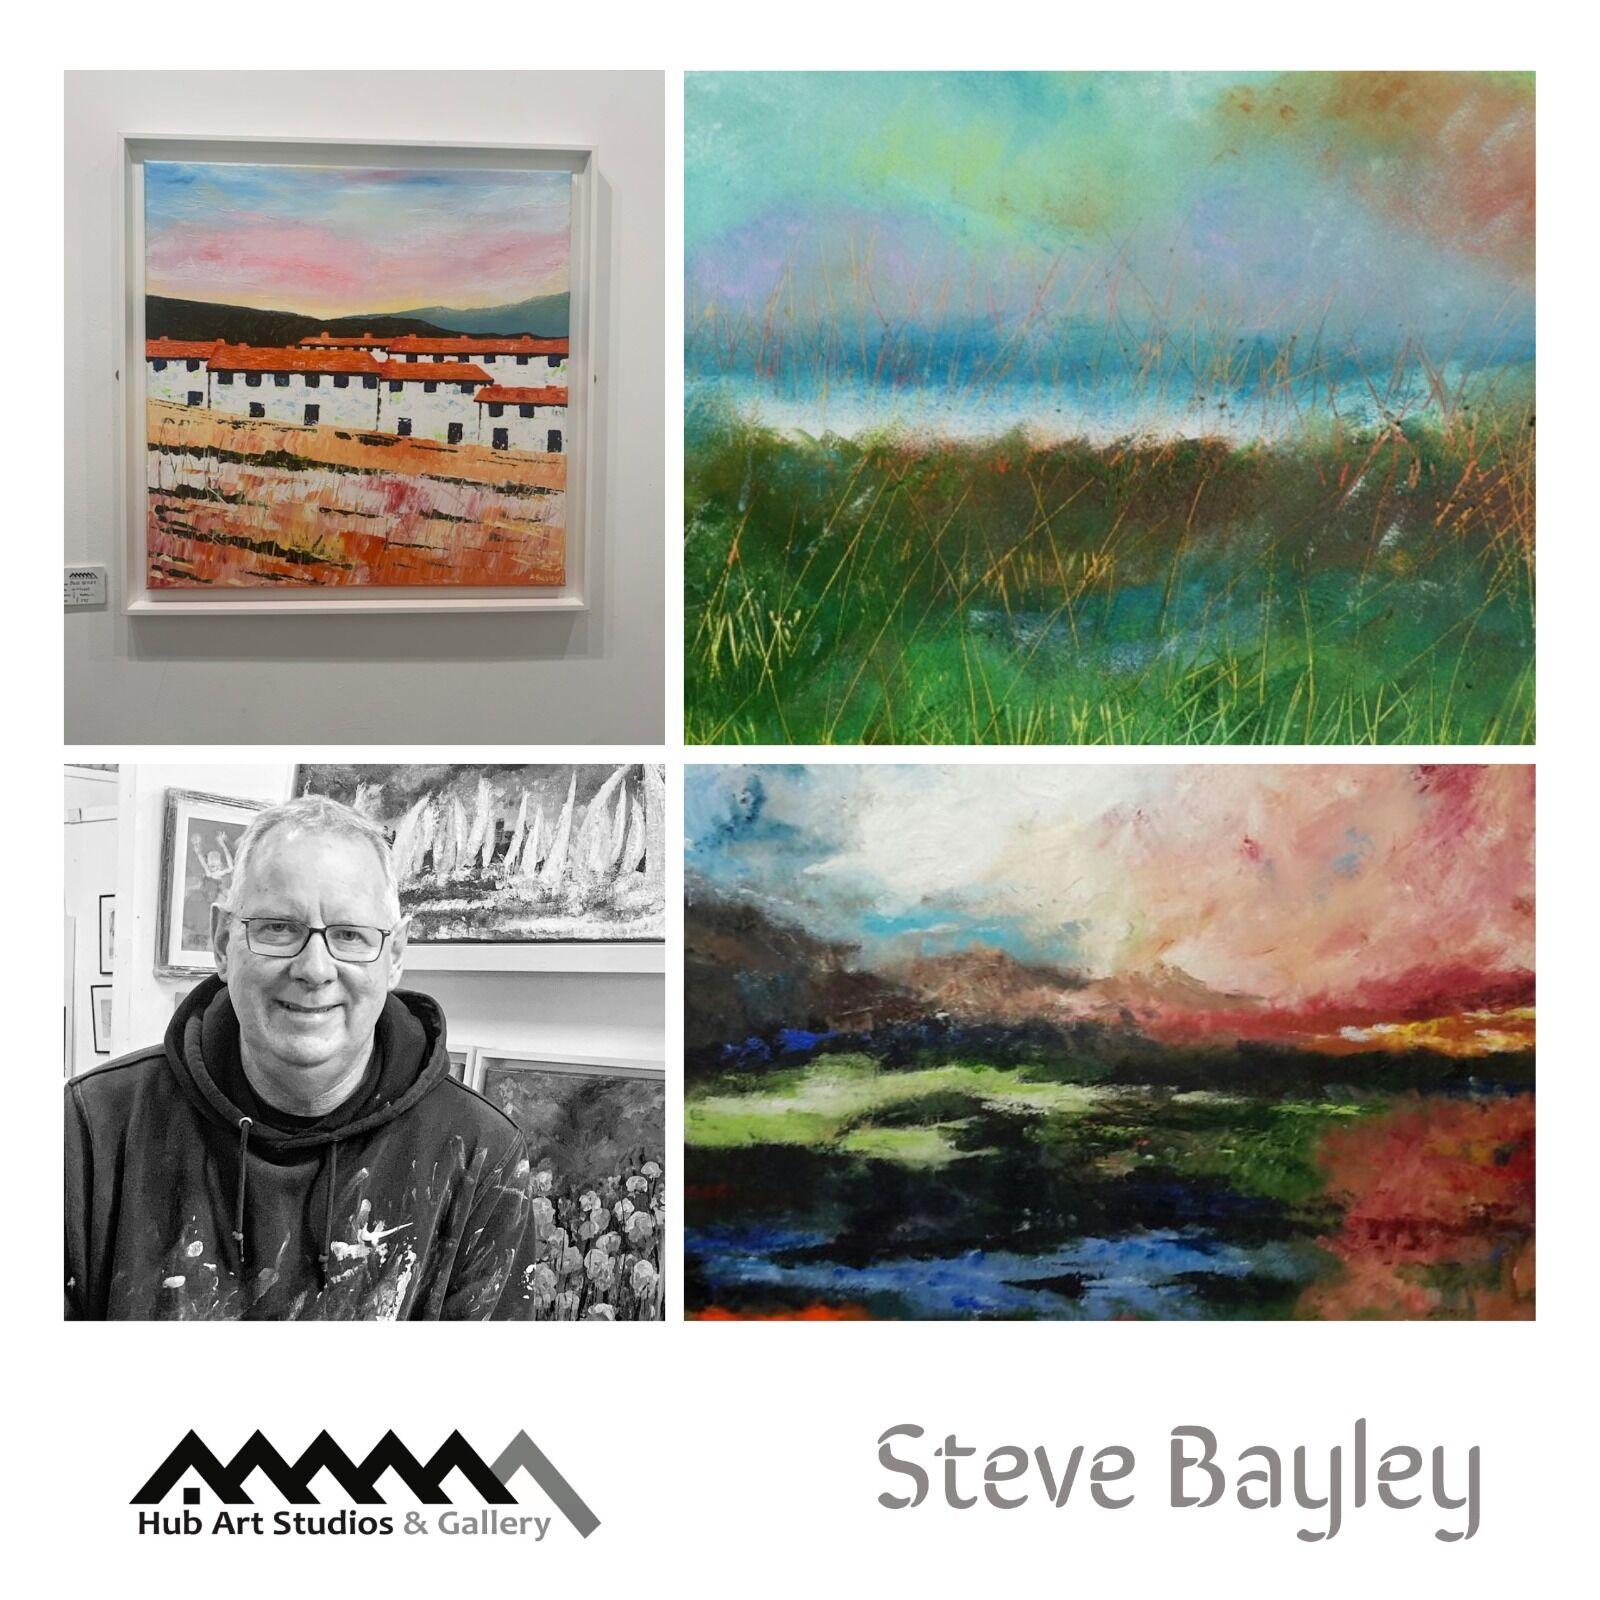 Steve Bayley